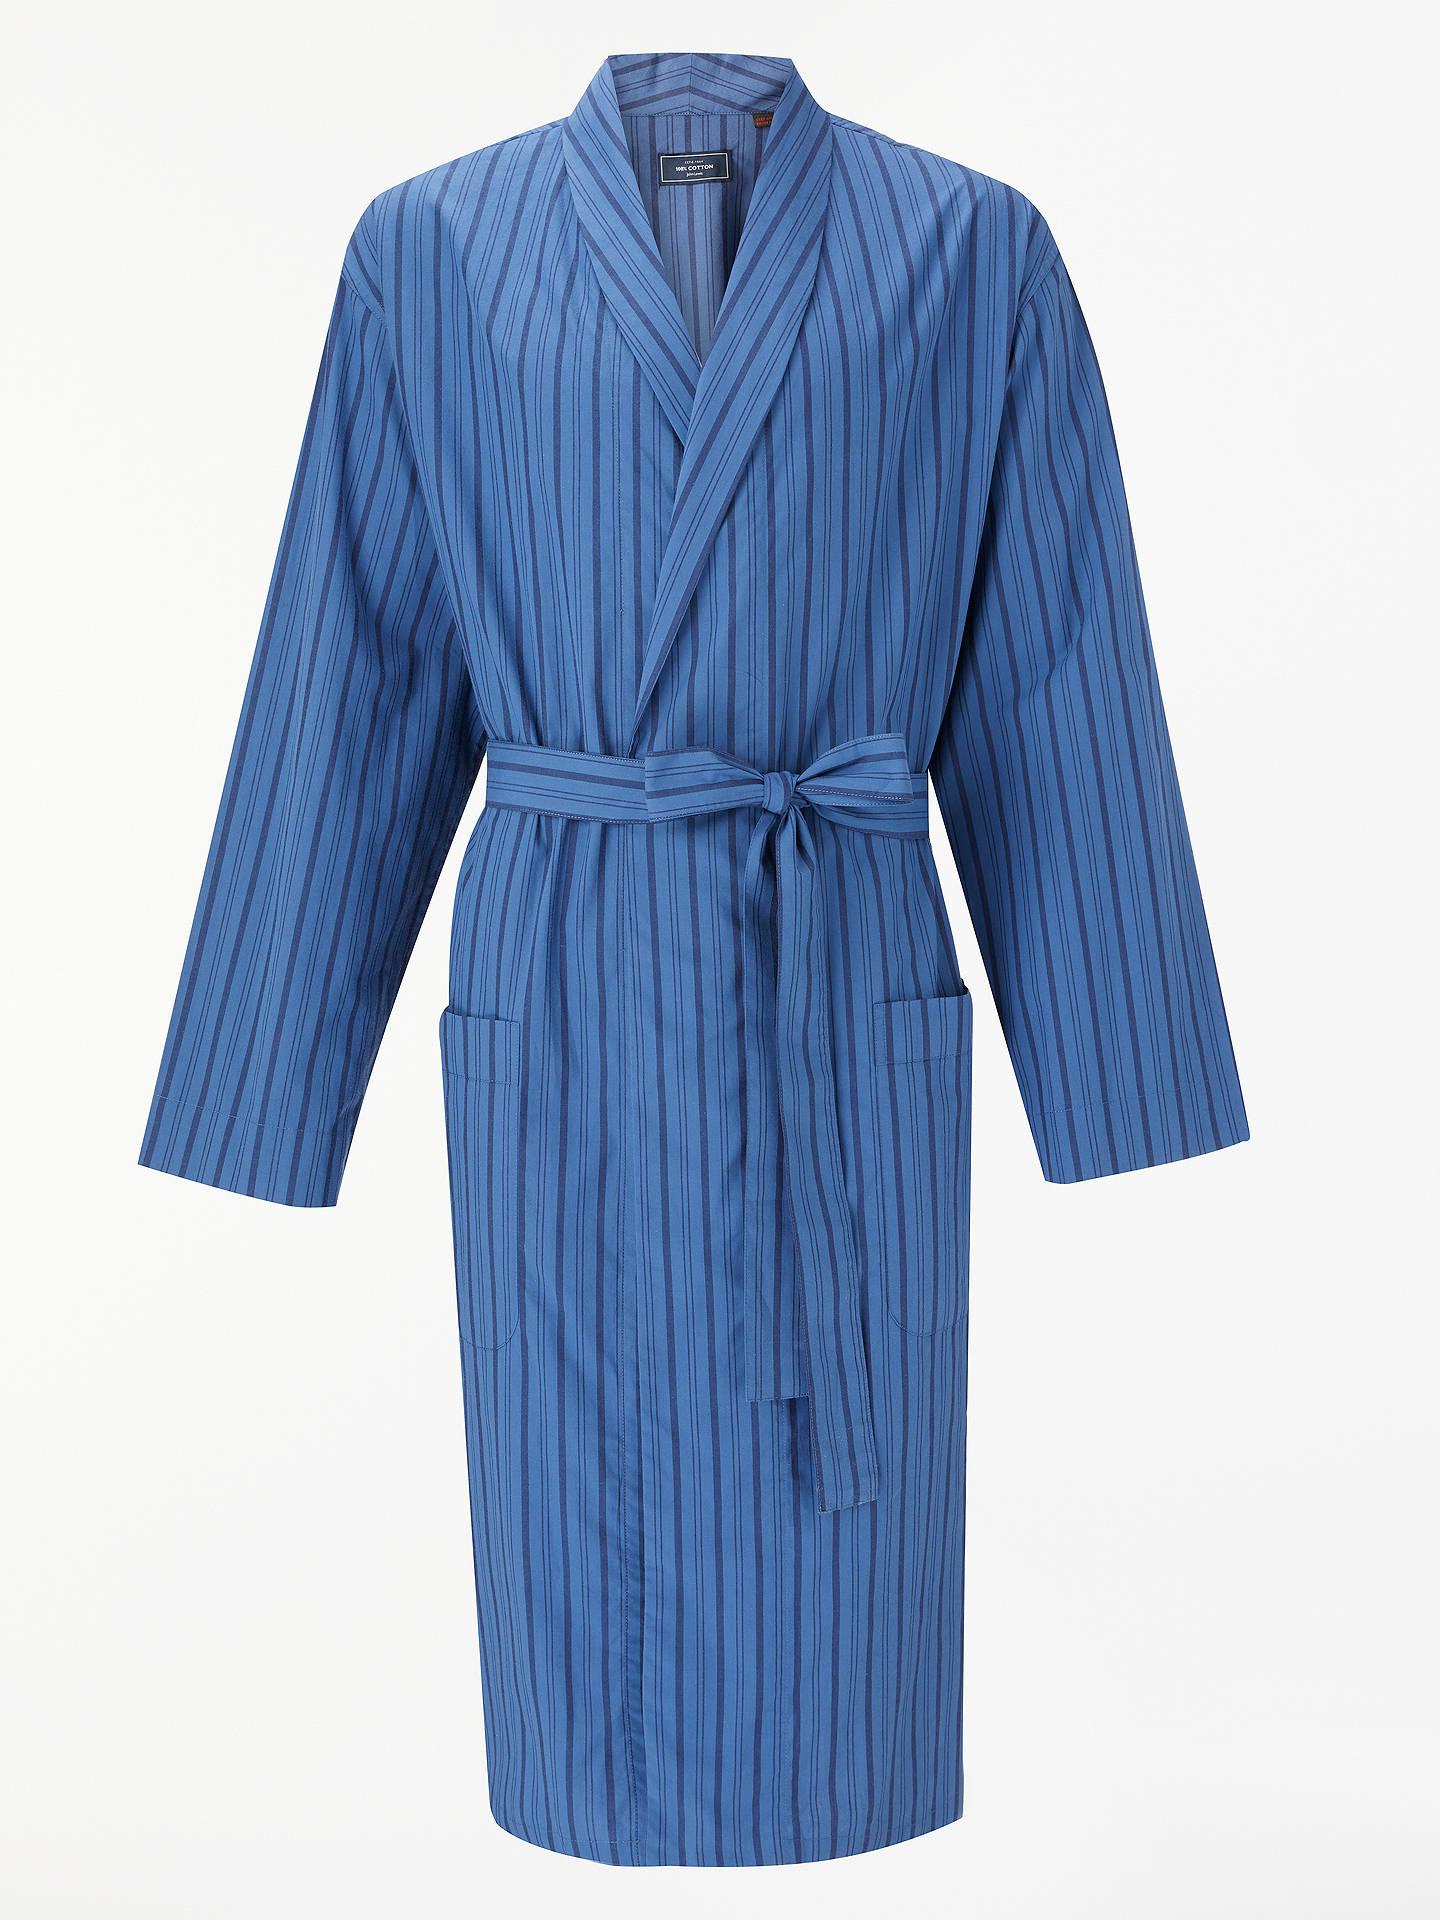 John Lewis Partners Woven Stripe Dressing Gown Blue At John Lewis